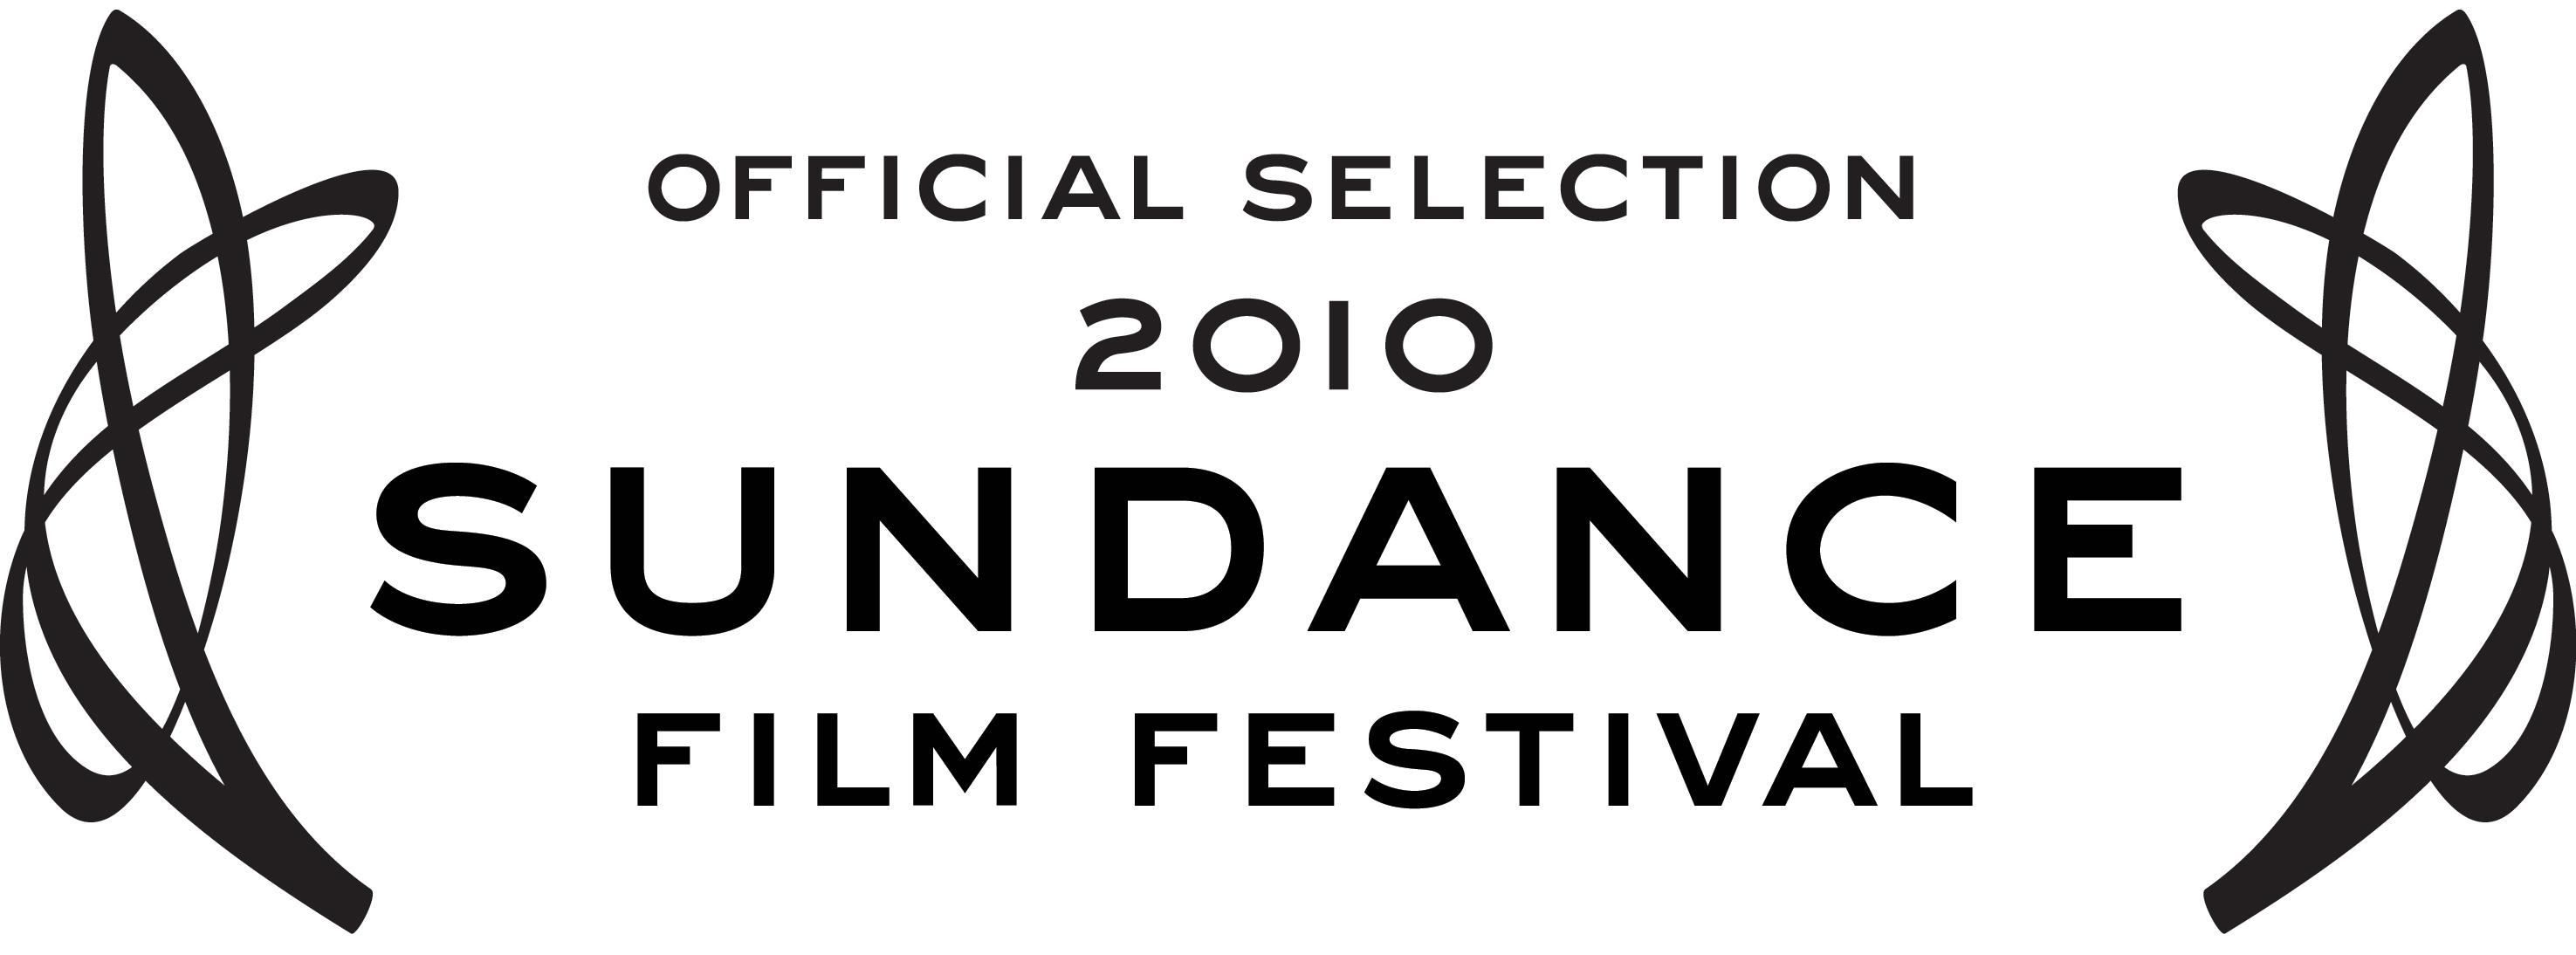 Film Festivals Logos And Types Blog Festival Logo Film Festival Festival